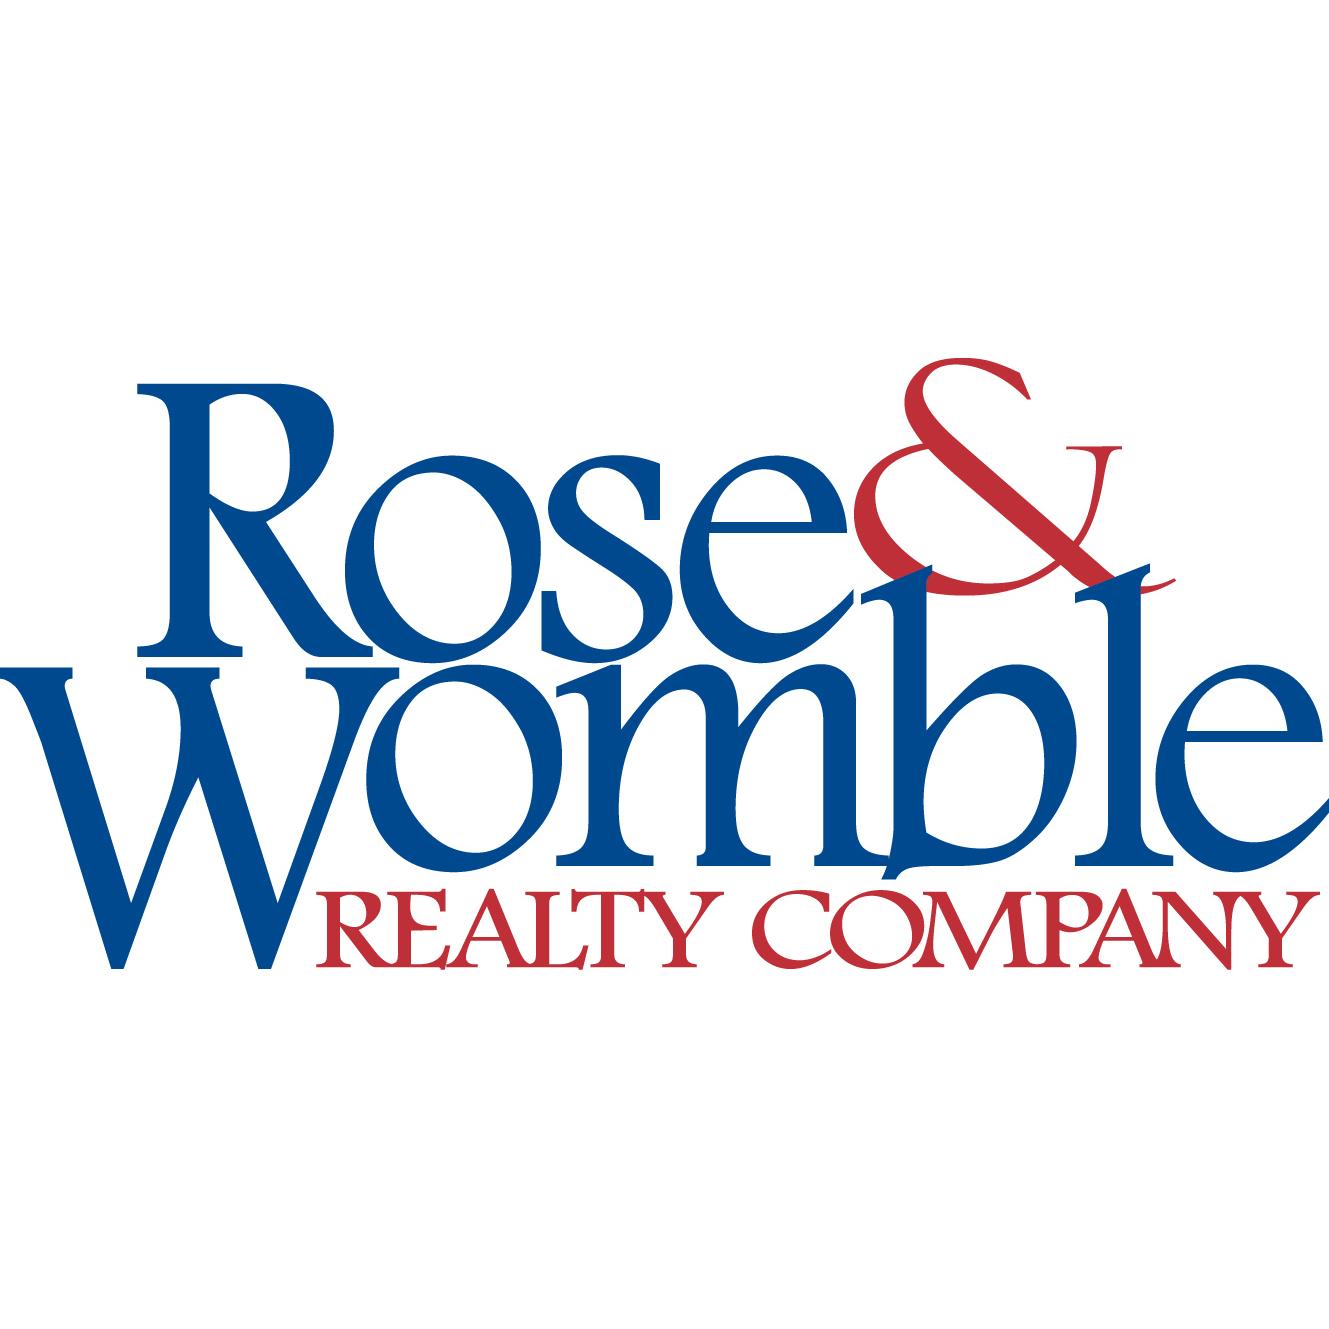 Rose & Womble Realty Company - Peninsula Office